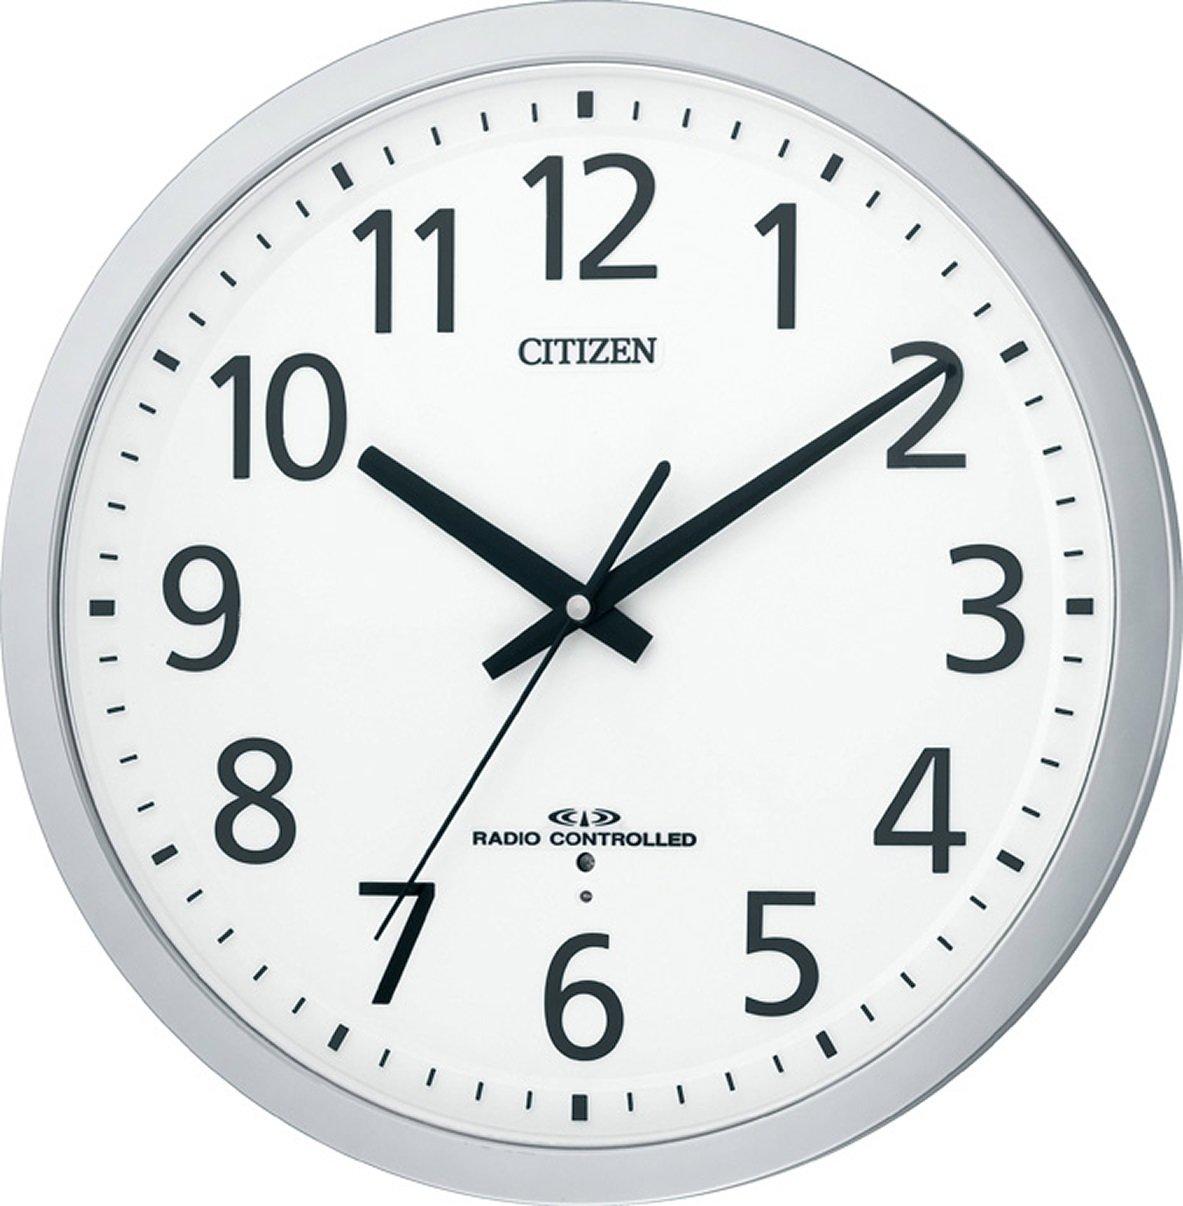 CITIZEN (シチズン) 掛時計 スペイシーM462 電波 時計 オフィスタイプ 見やすいフォント 8MY462-019 B0040EJS1E